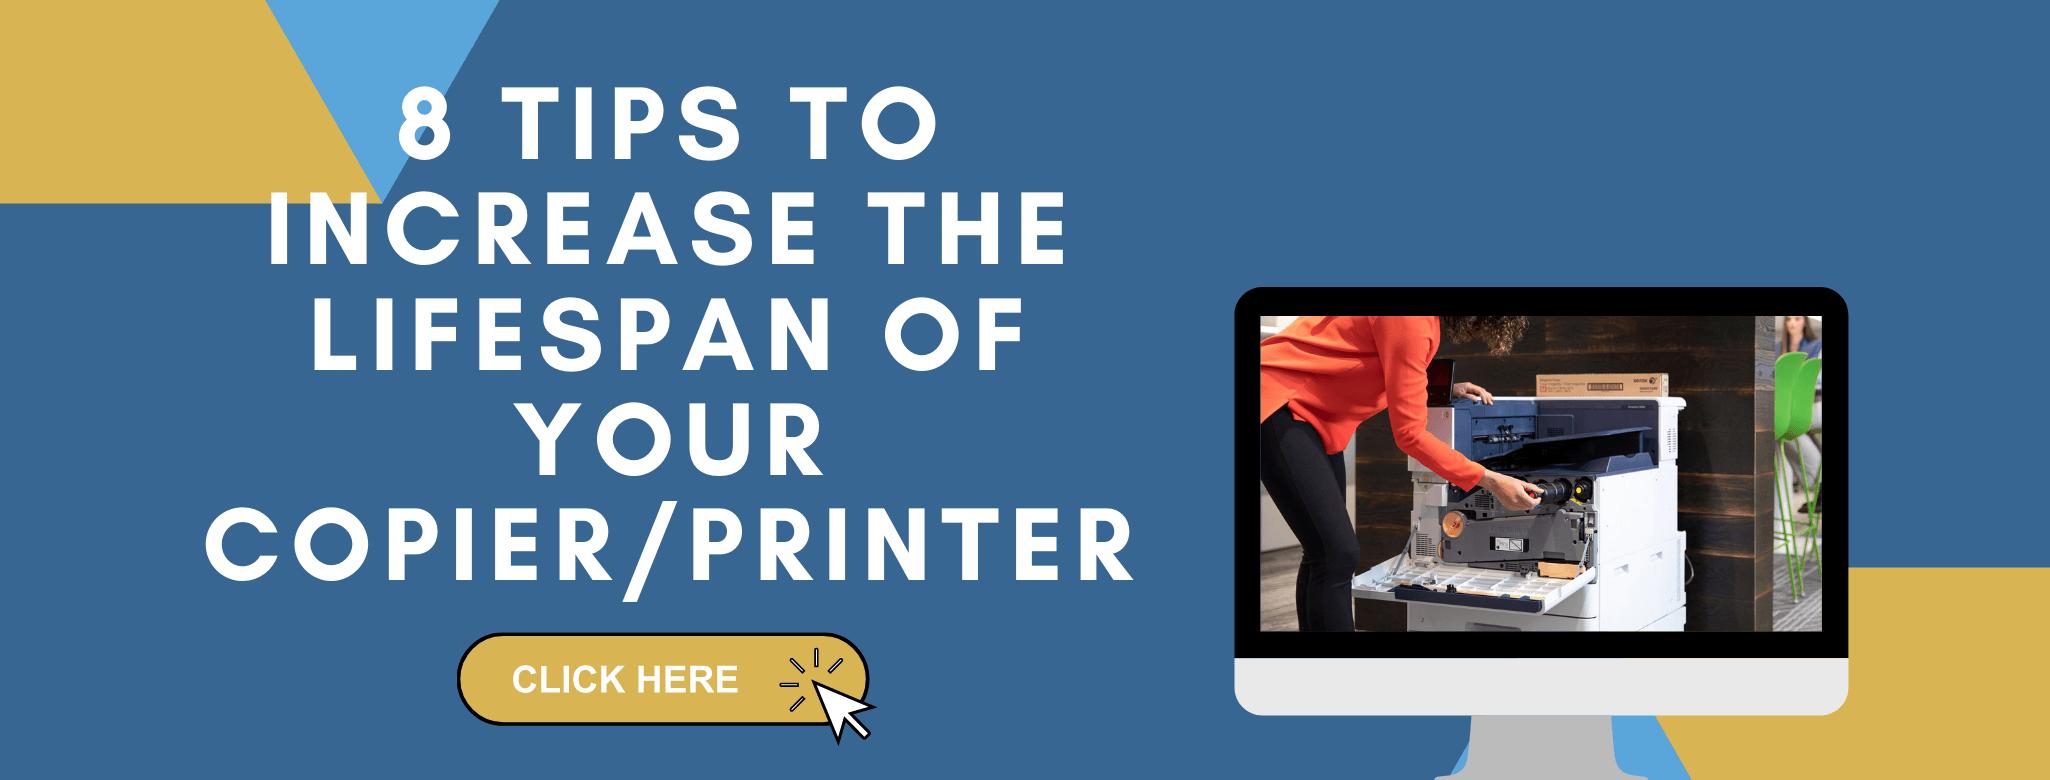 tips to increase lifespan of copier or printer